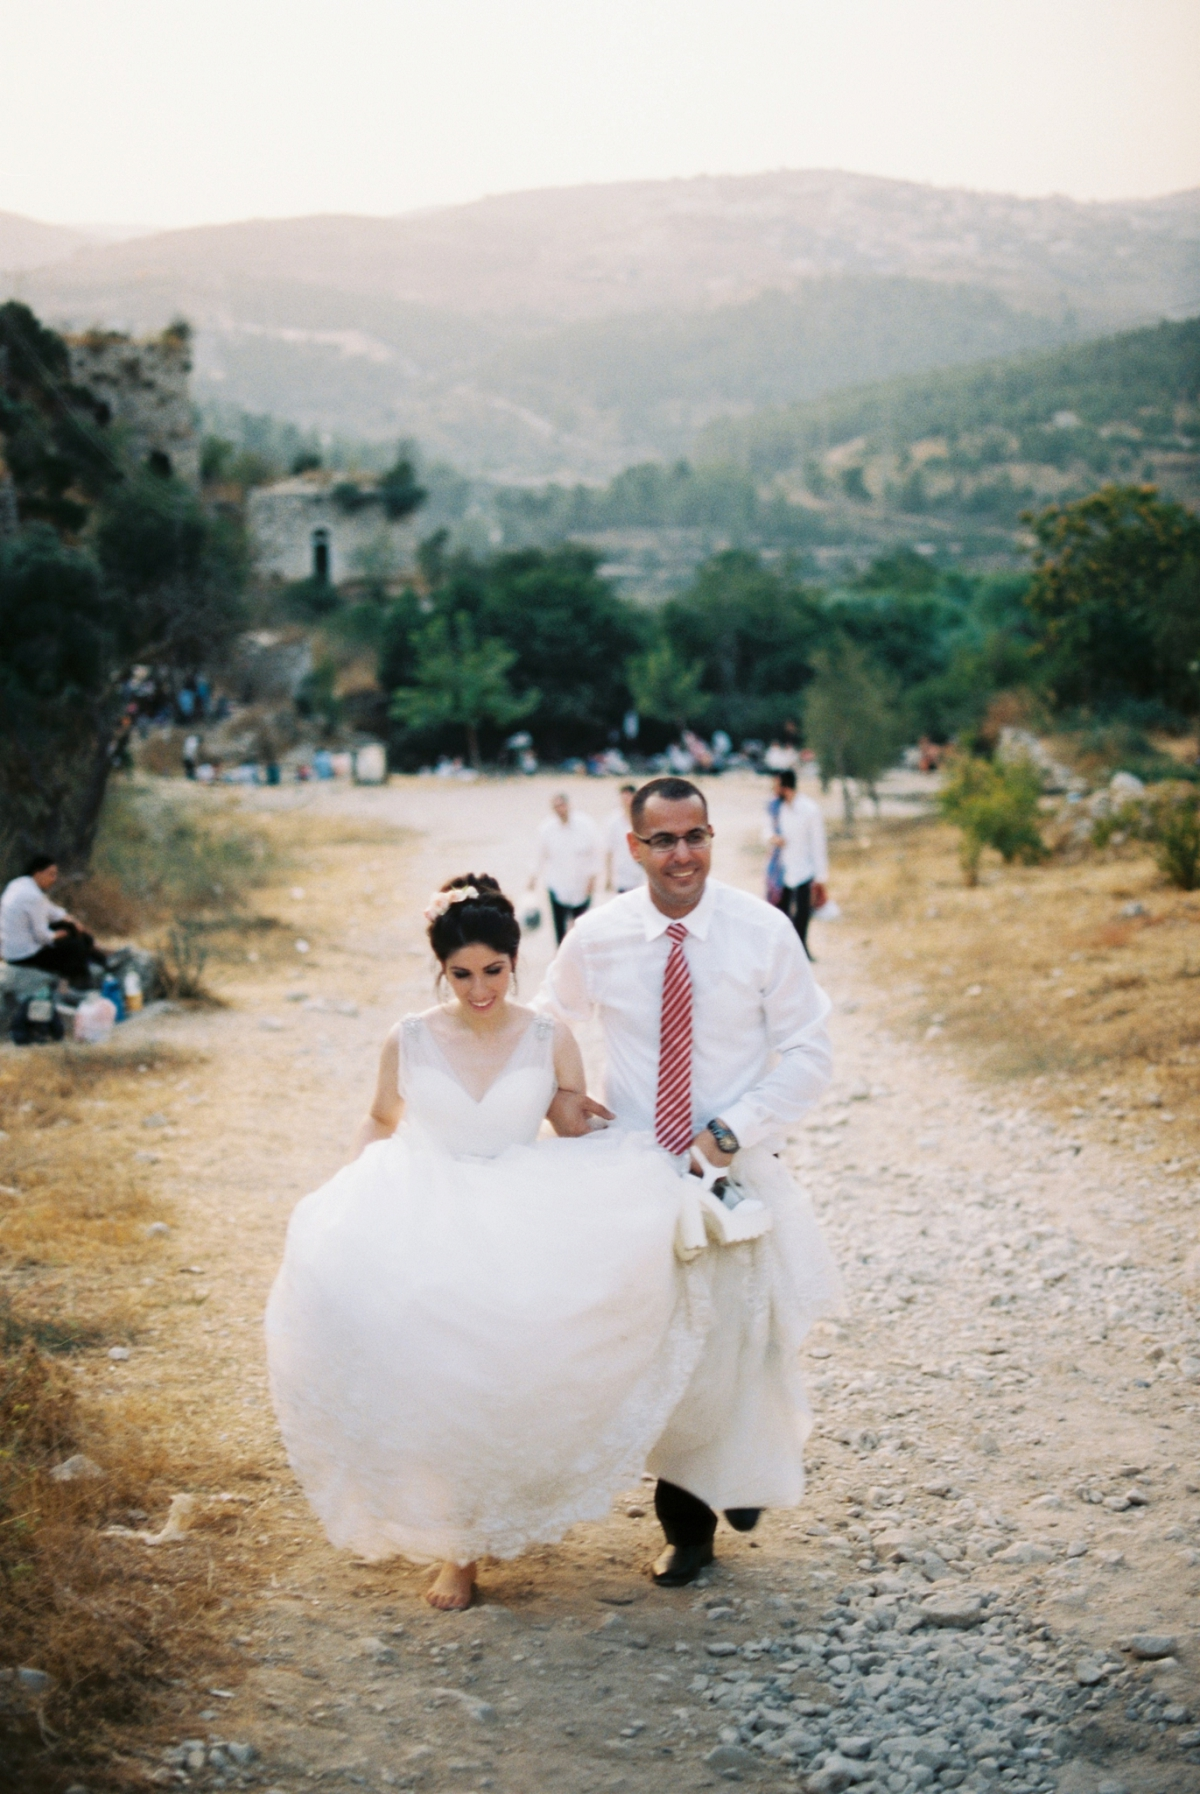 Lifta Bridal Portraits - Jerusalem Israel - Muna and Ali - Sigala Photography_0023